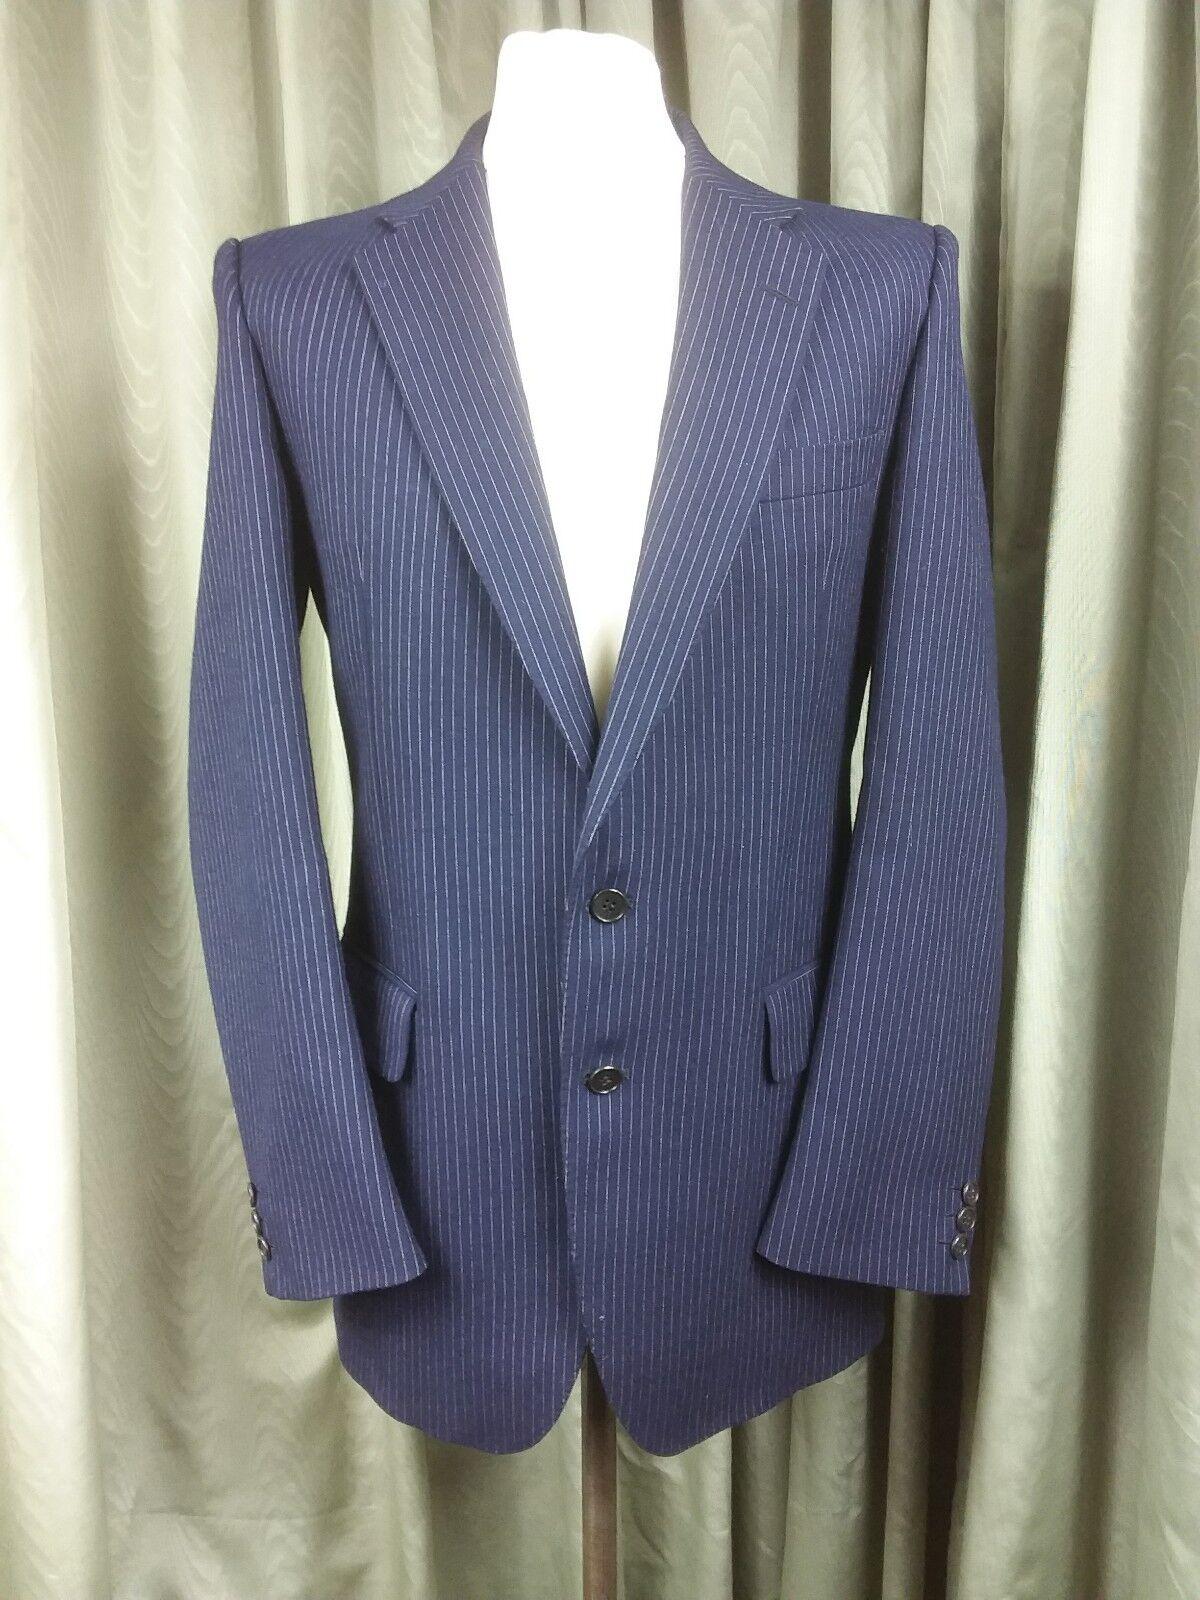 Austin Reed 100% Wool Navy Pinstripe Suit C40L W33 L30.75